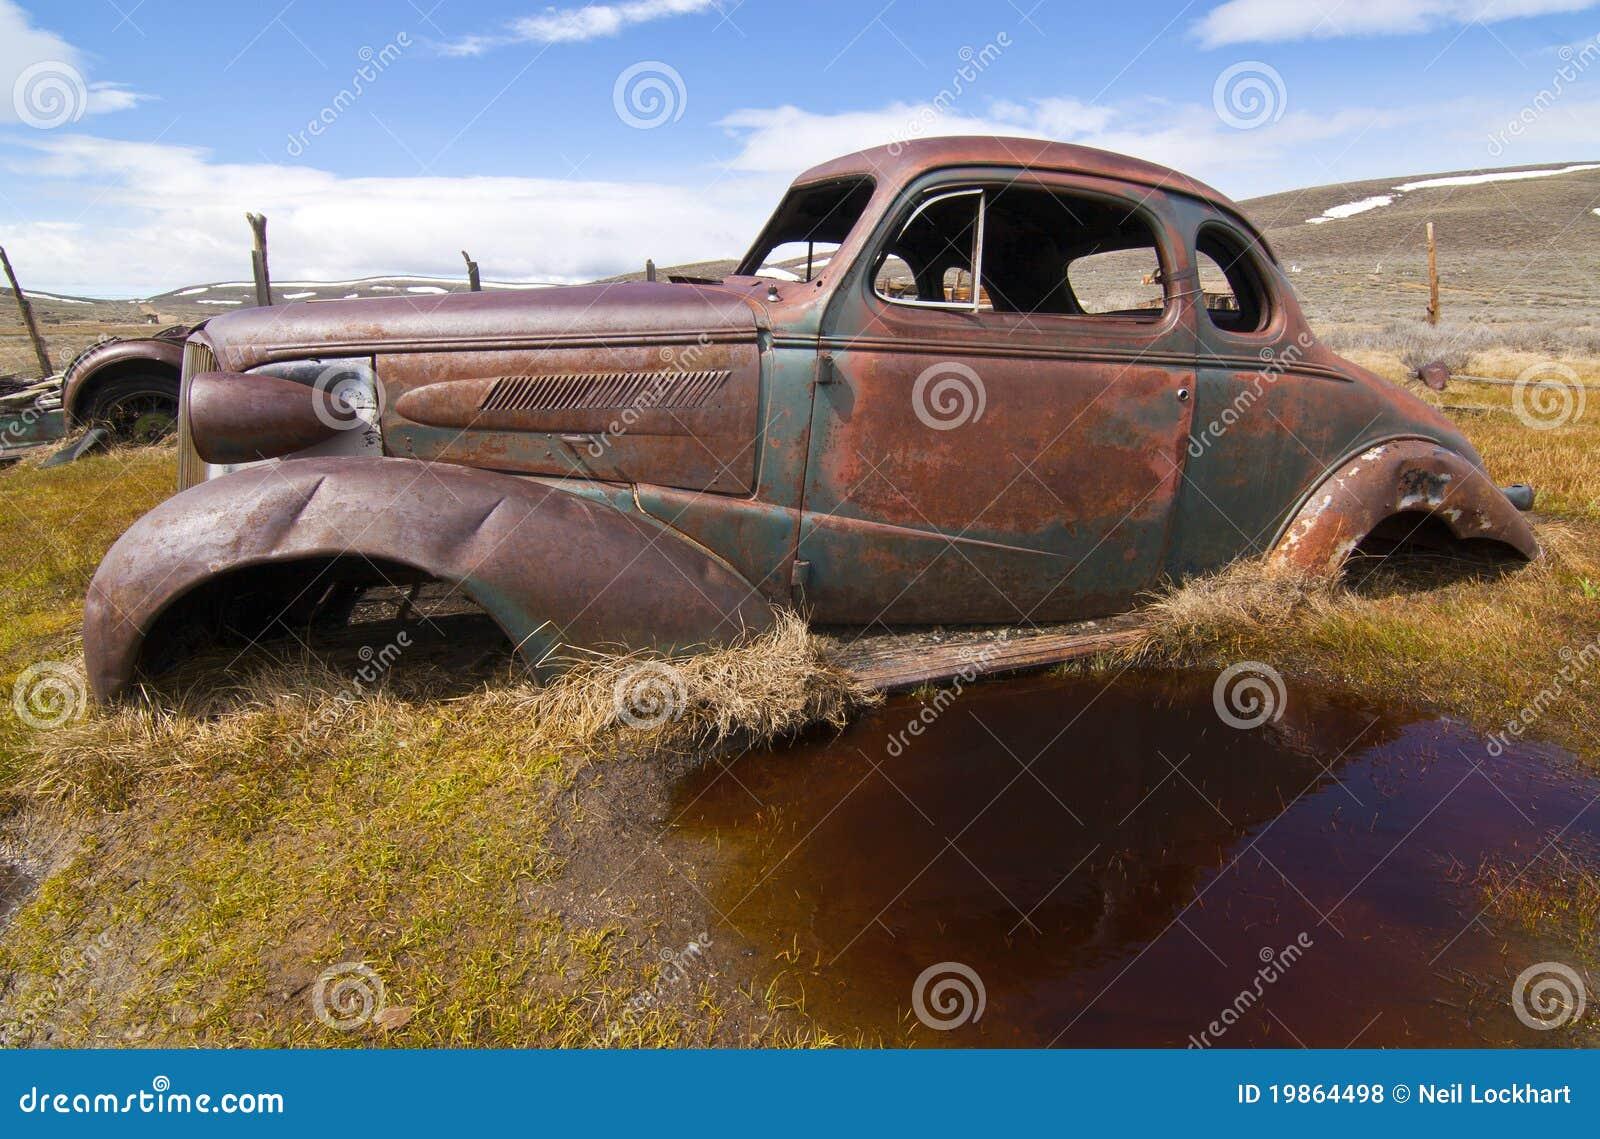 Junk yards that buy junk cars 18